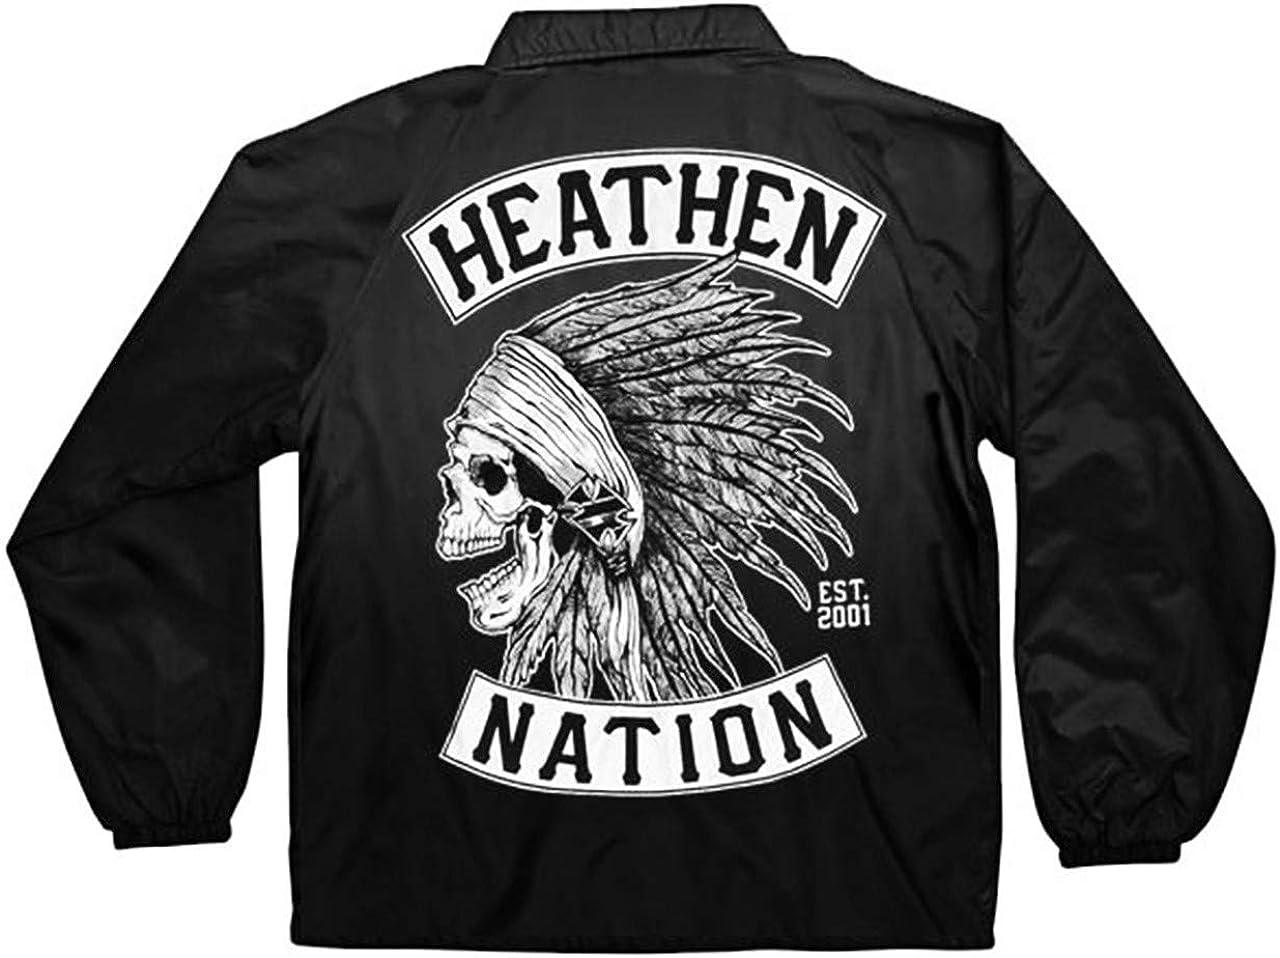 Heathen Chief Pullover Hoody